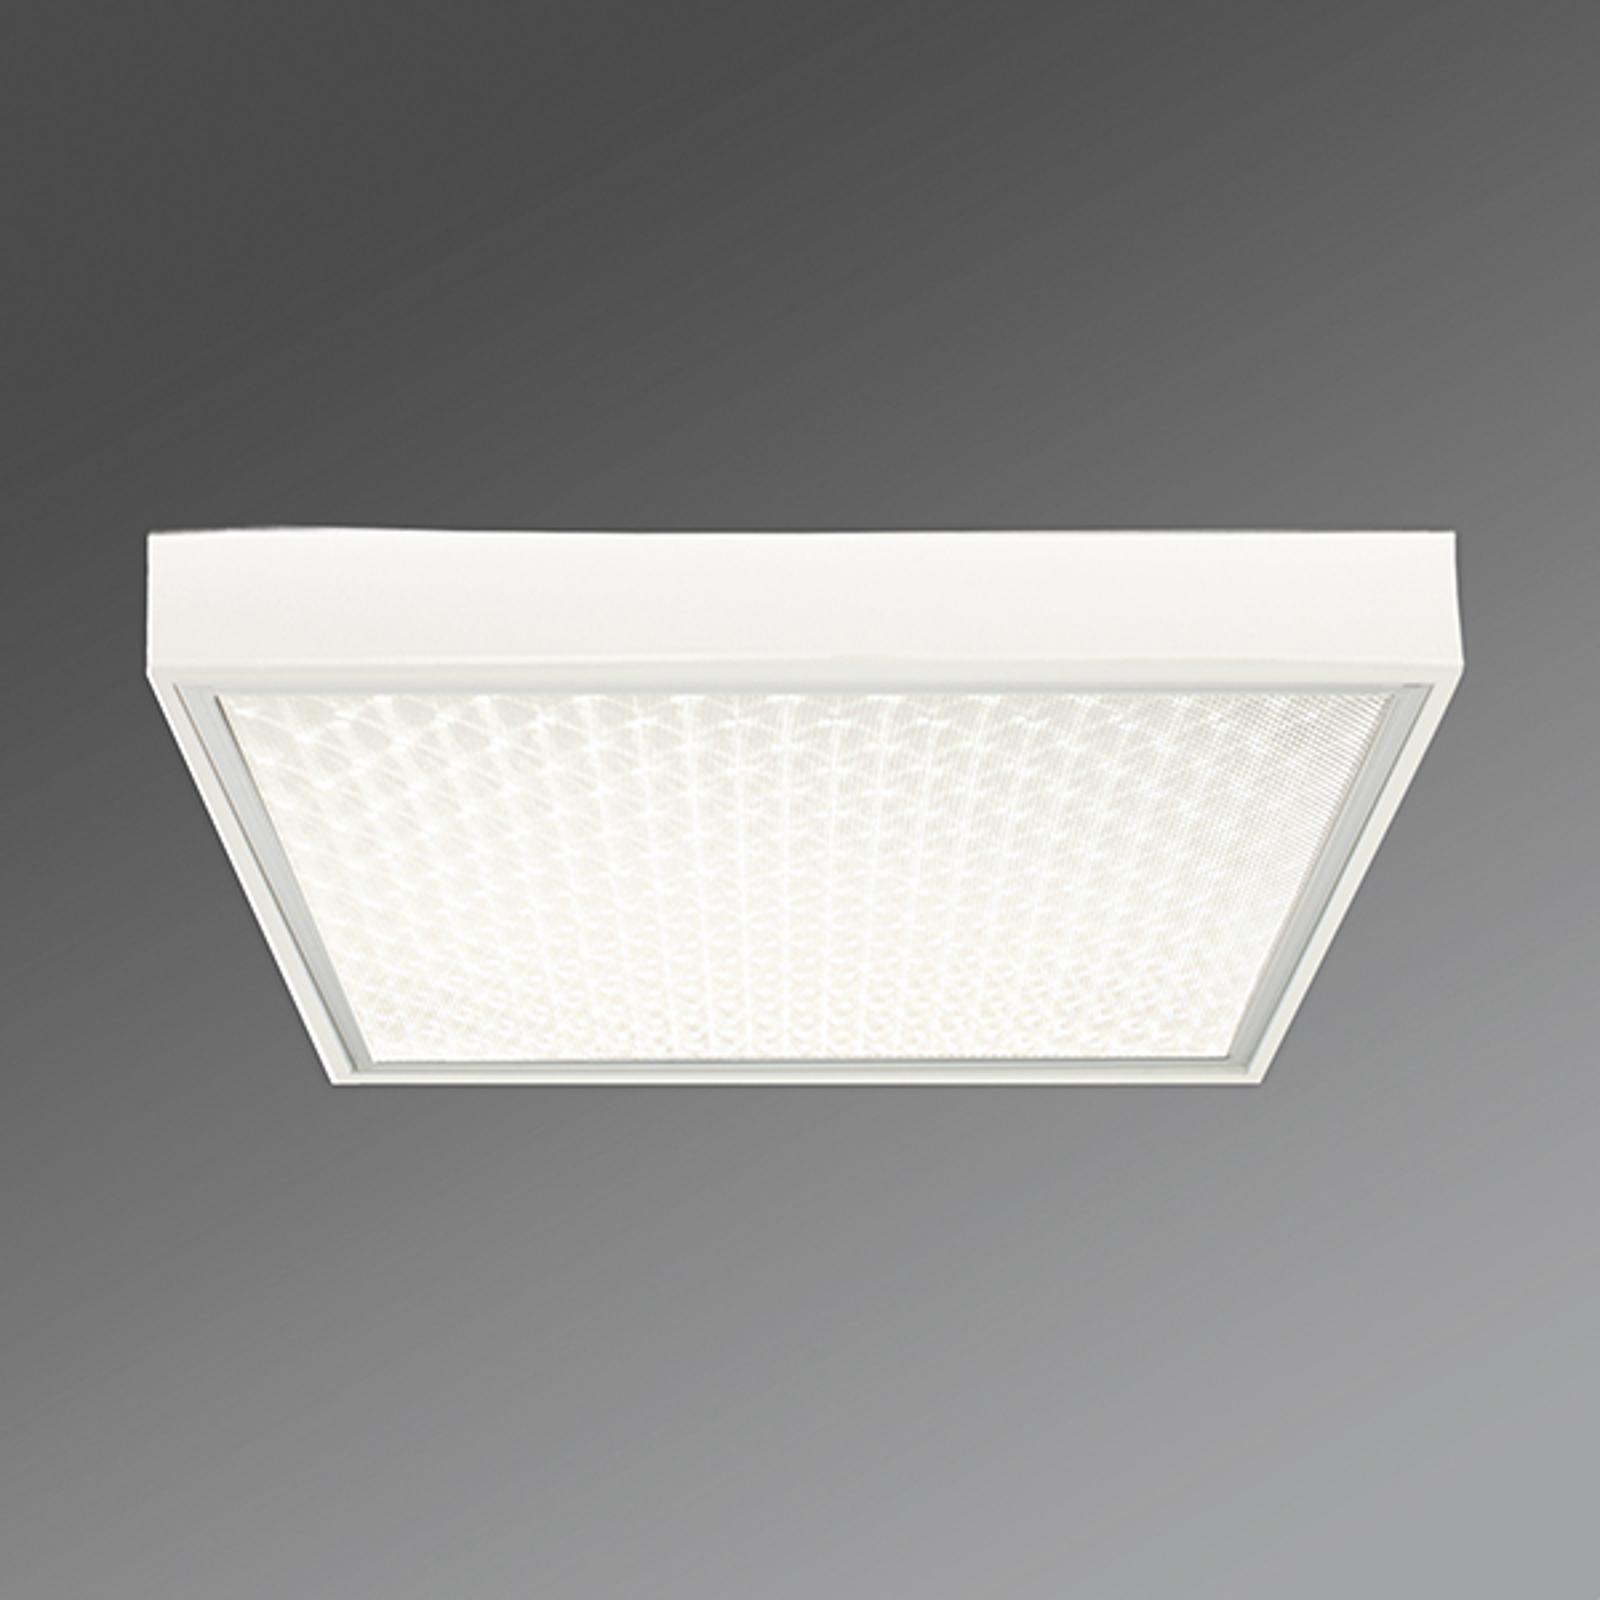 Biurowa lampa sufitowa Protection-PRAMP 660 BAP